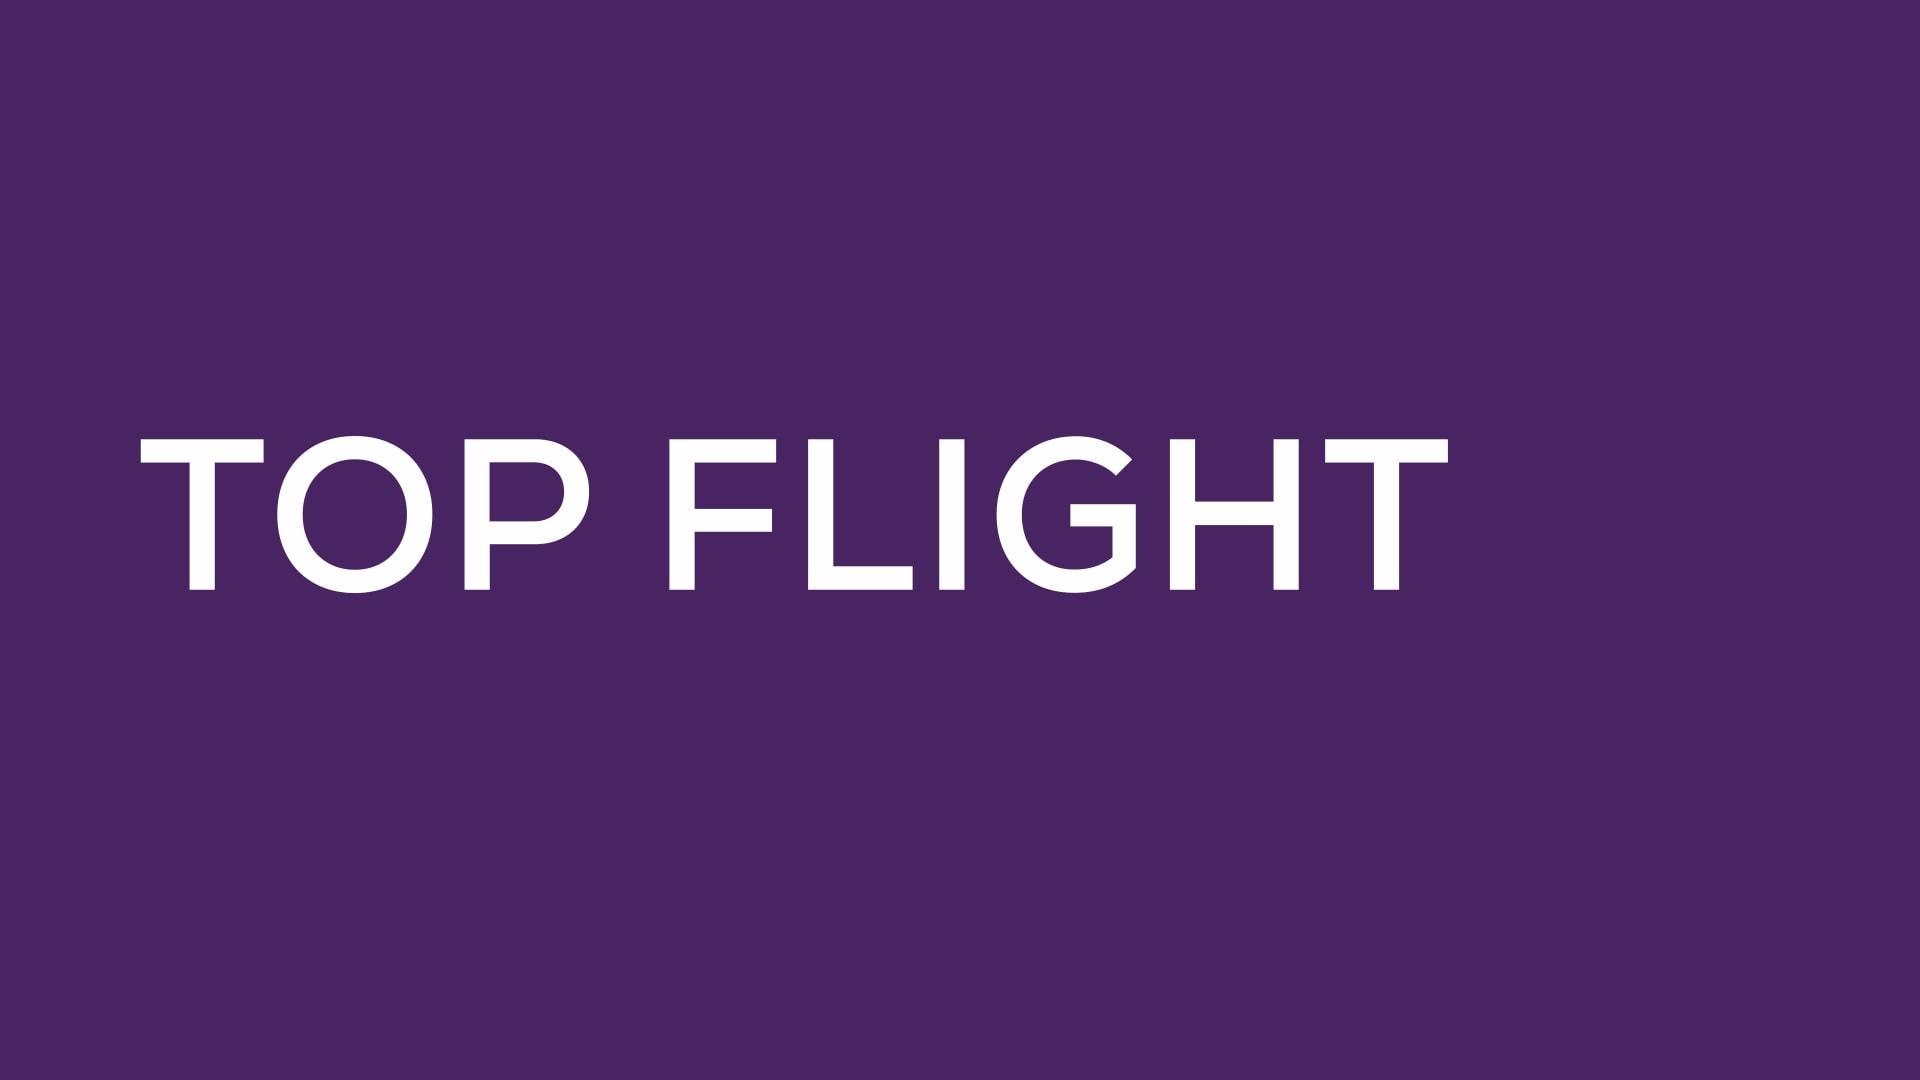 Top Flight